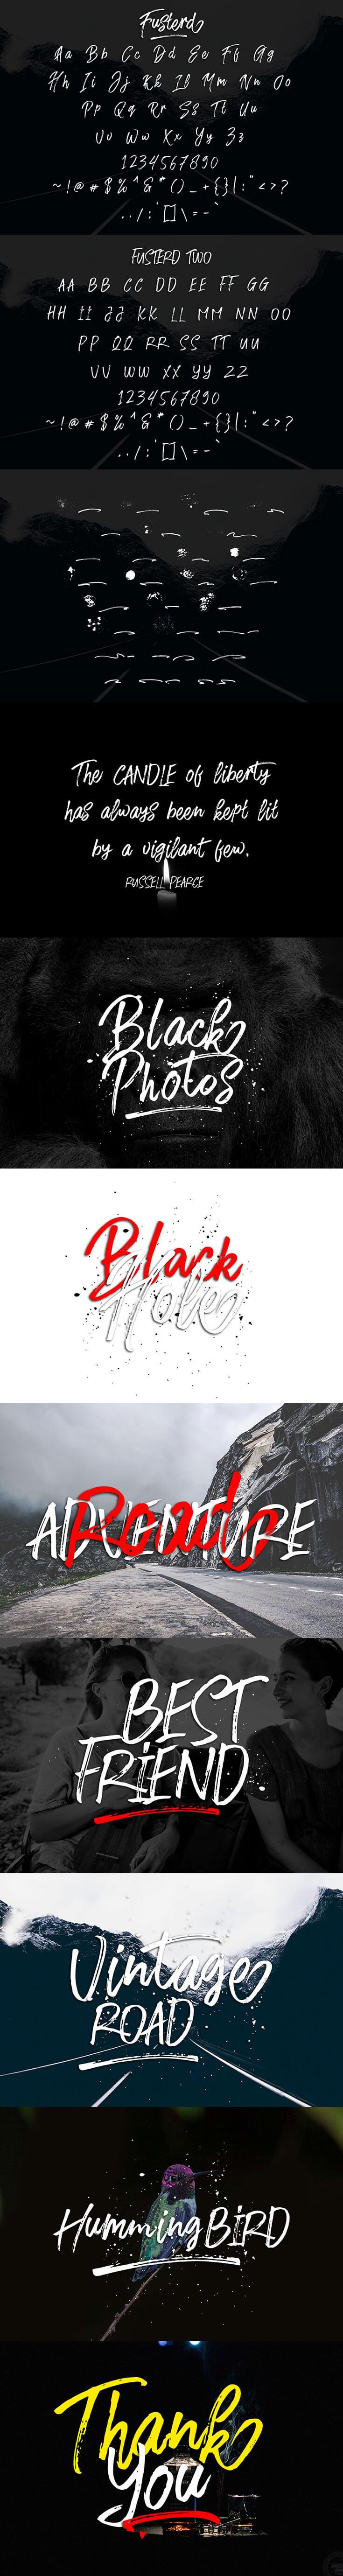 Free Fusterd Brush Typeface